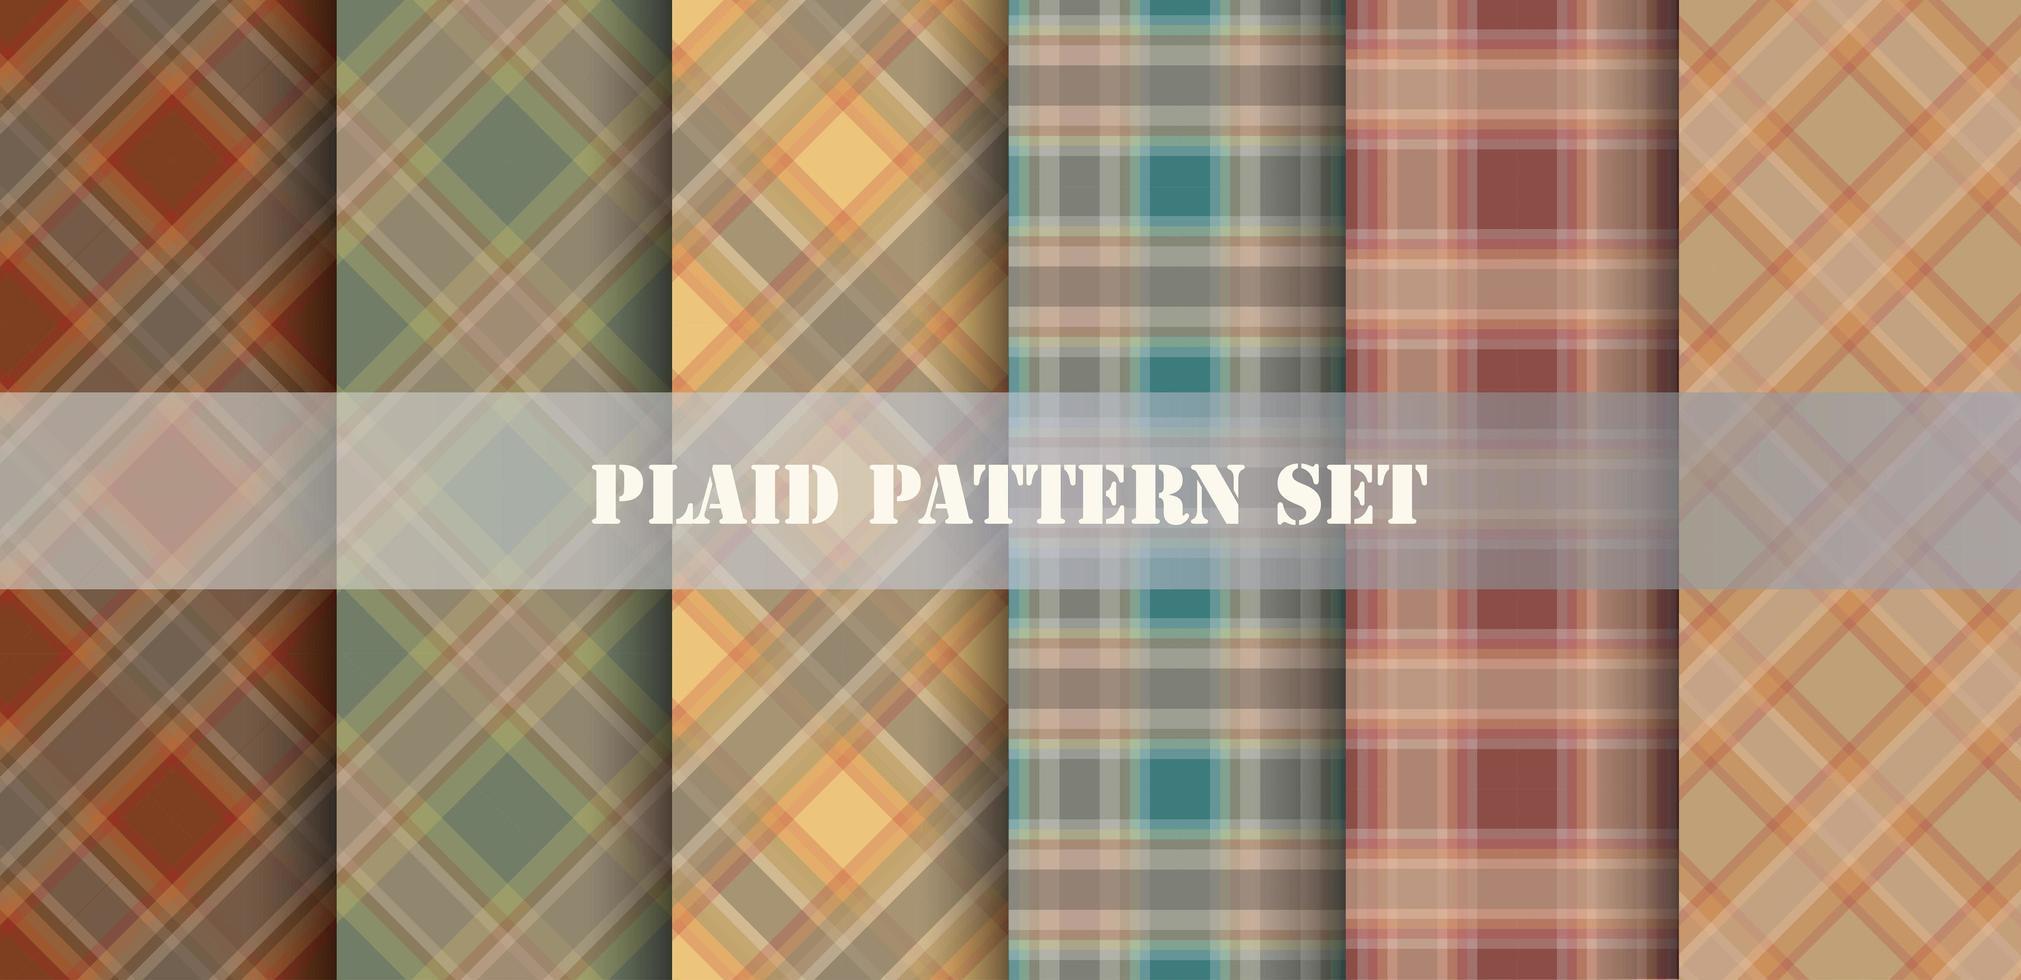 Plaid Orange and Blue Patterns Set vector